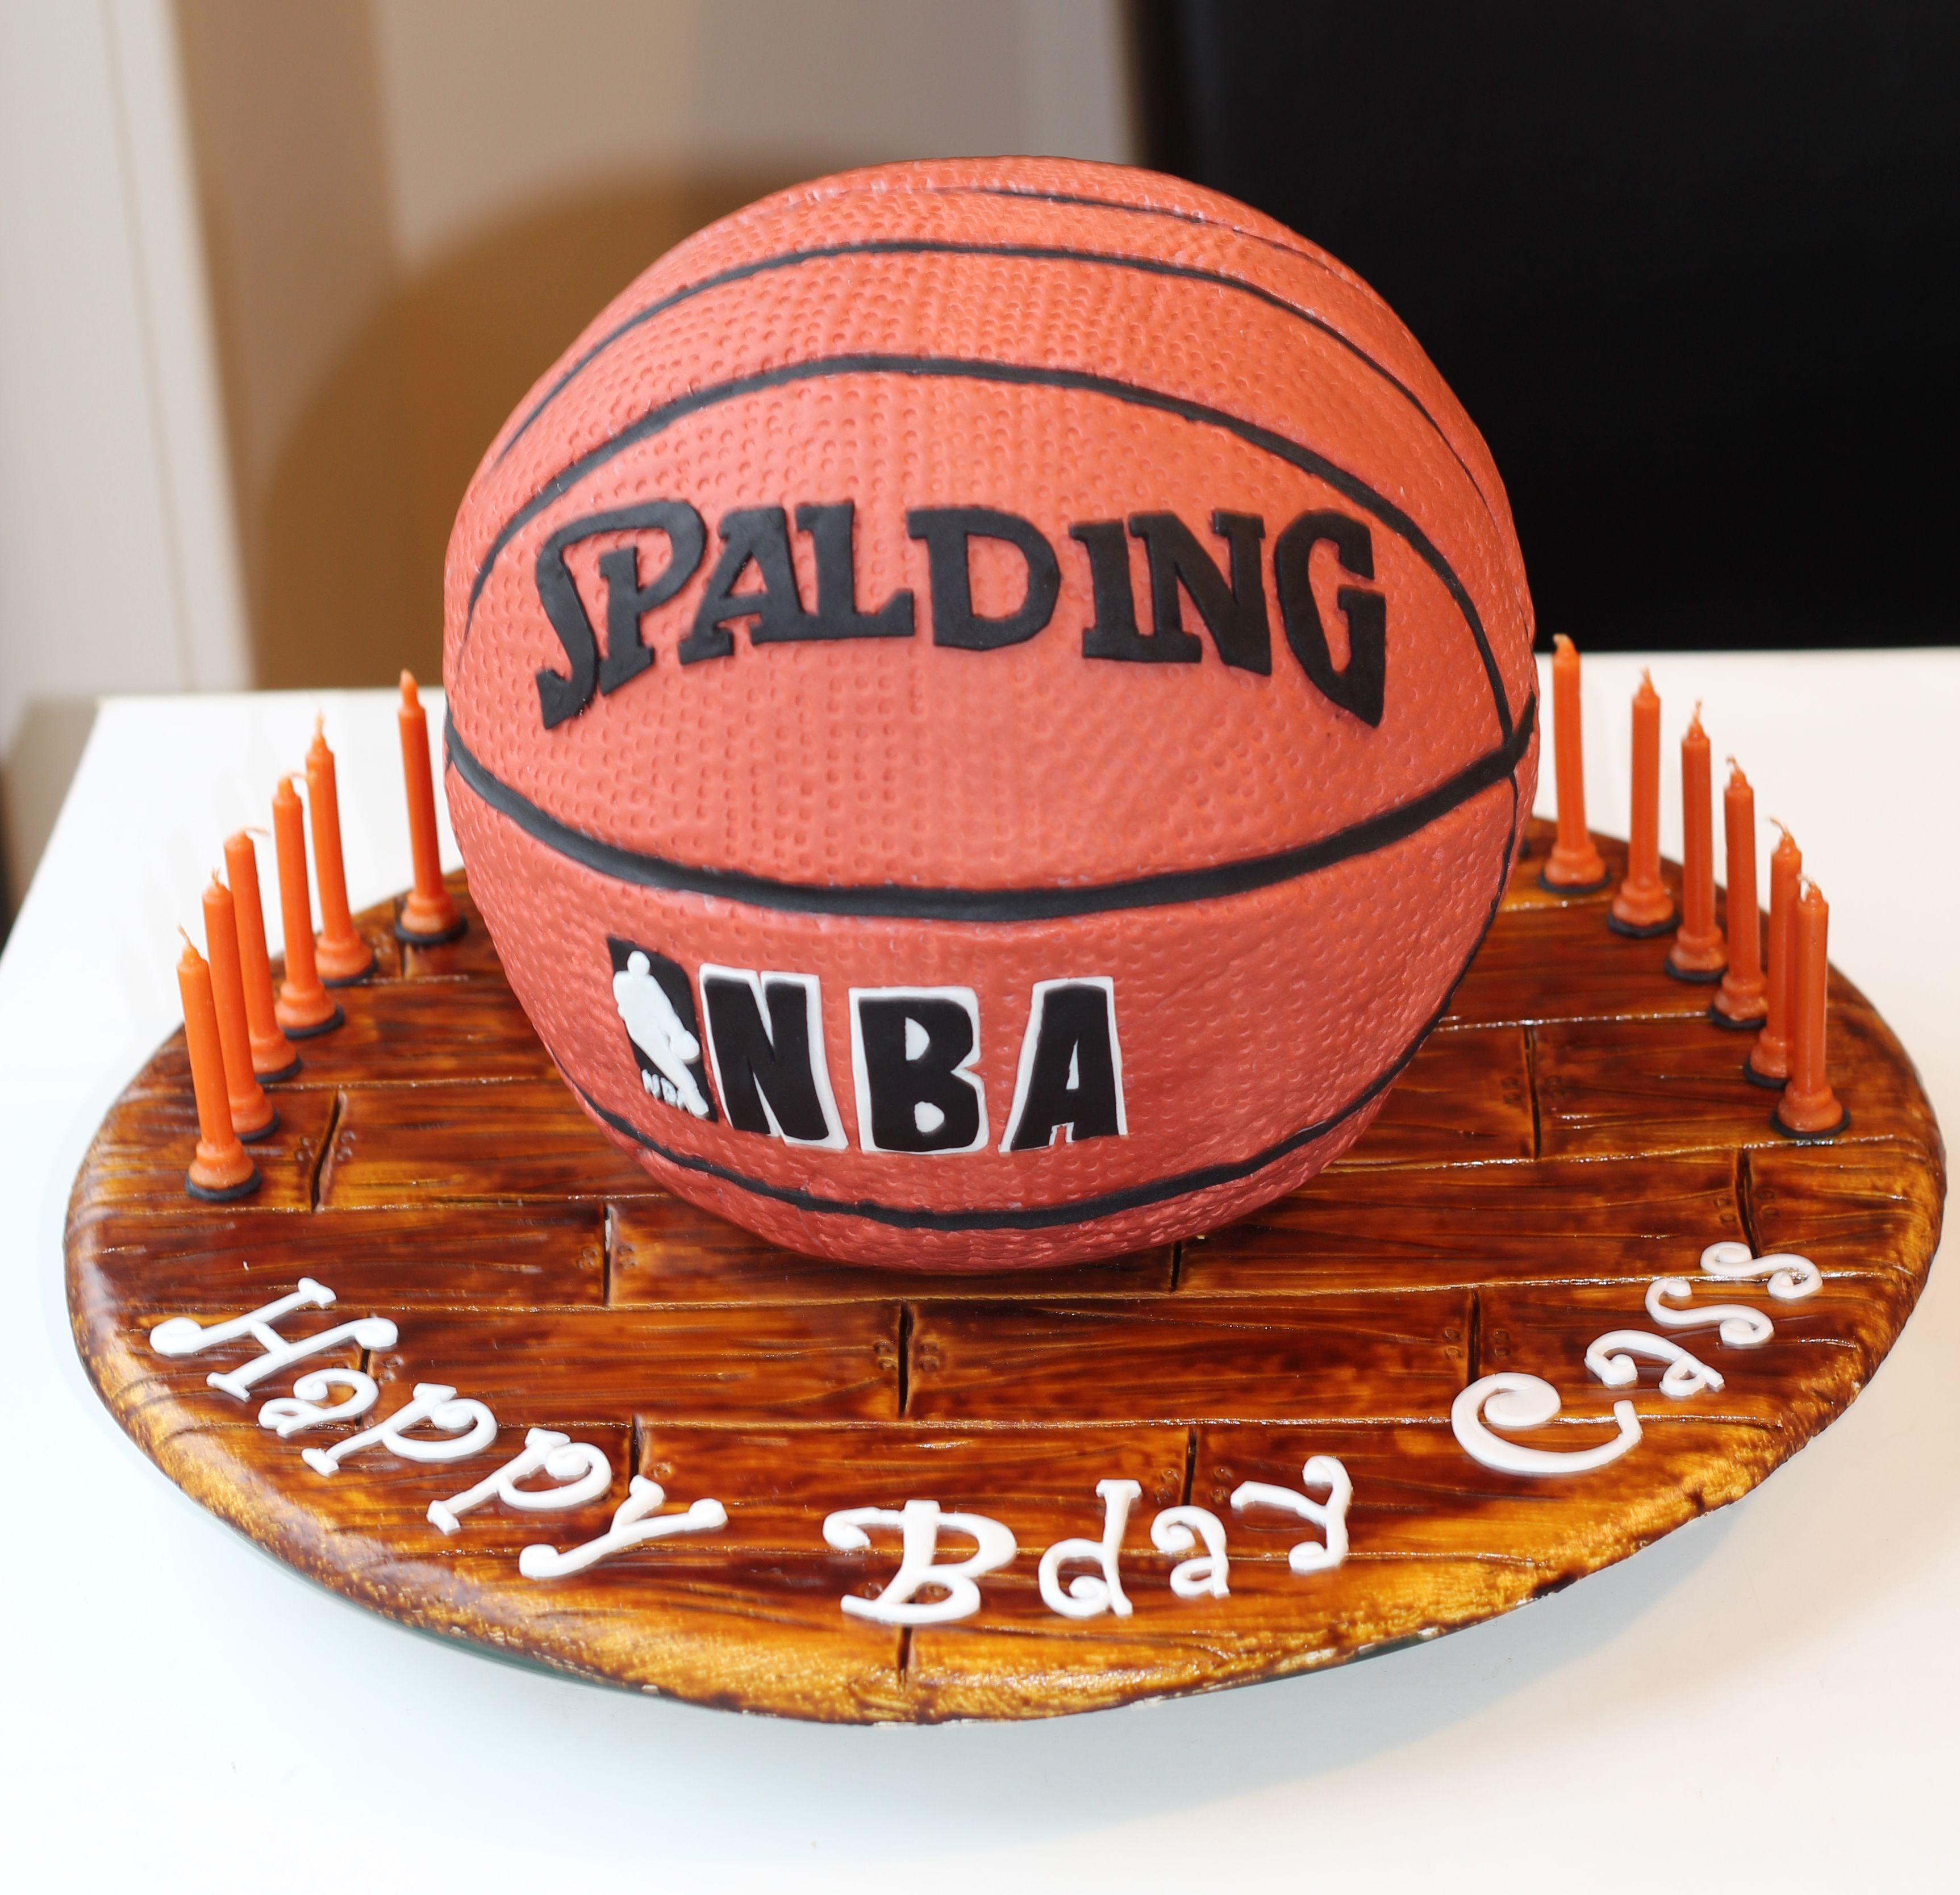 Basketball Cake Red Velvet With Cream Cheese Red Velvet Cake Character Cupcakes Red Velvet